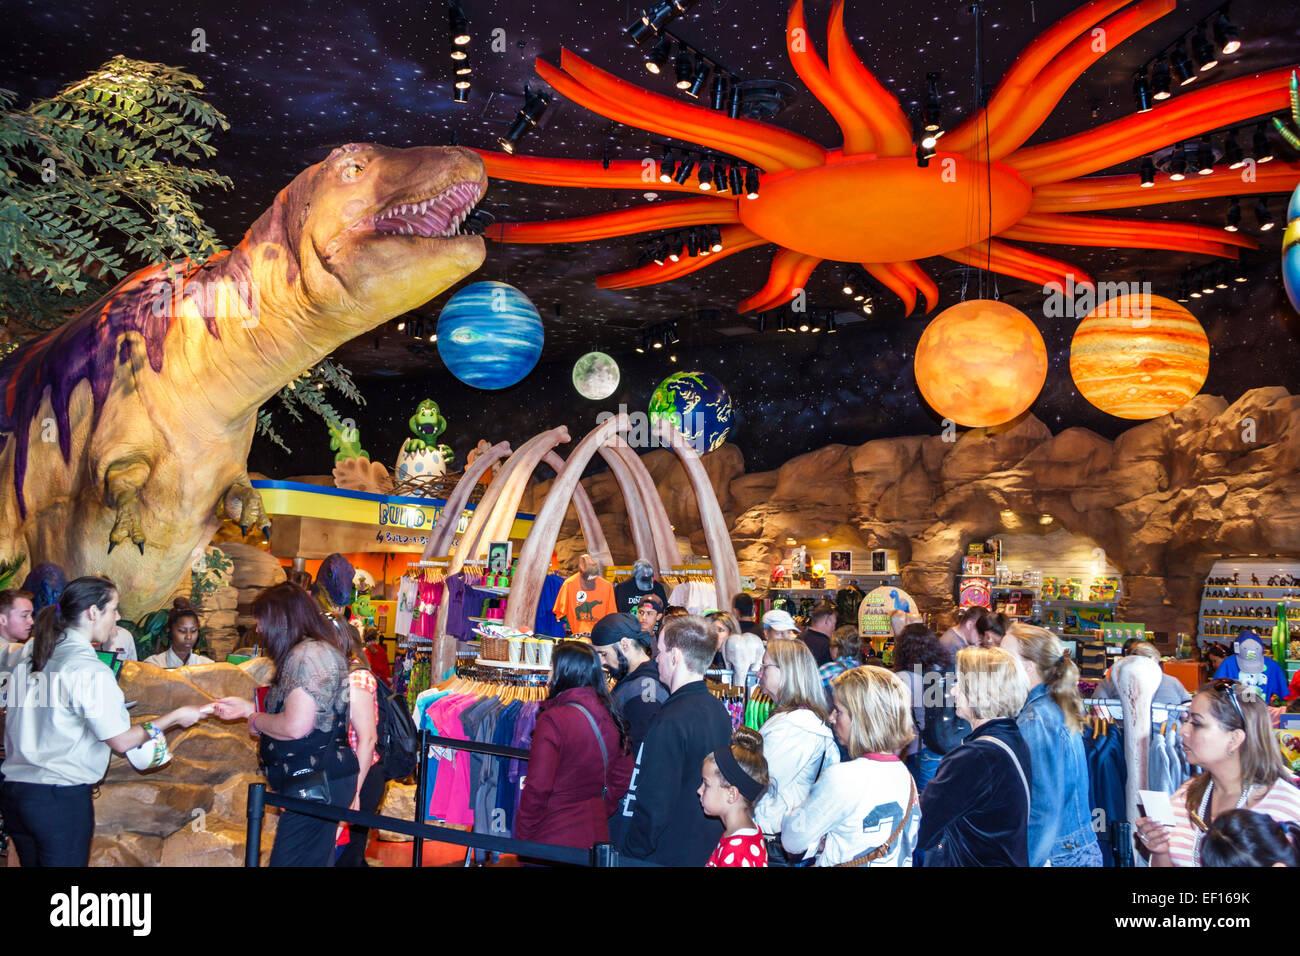 Orlando Lake Buena Vista en Florida Downtown Disney, tiendas, restaurantes entretenimiento T-Rex dinosaurio restaurante Imagen De Stock